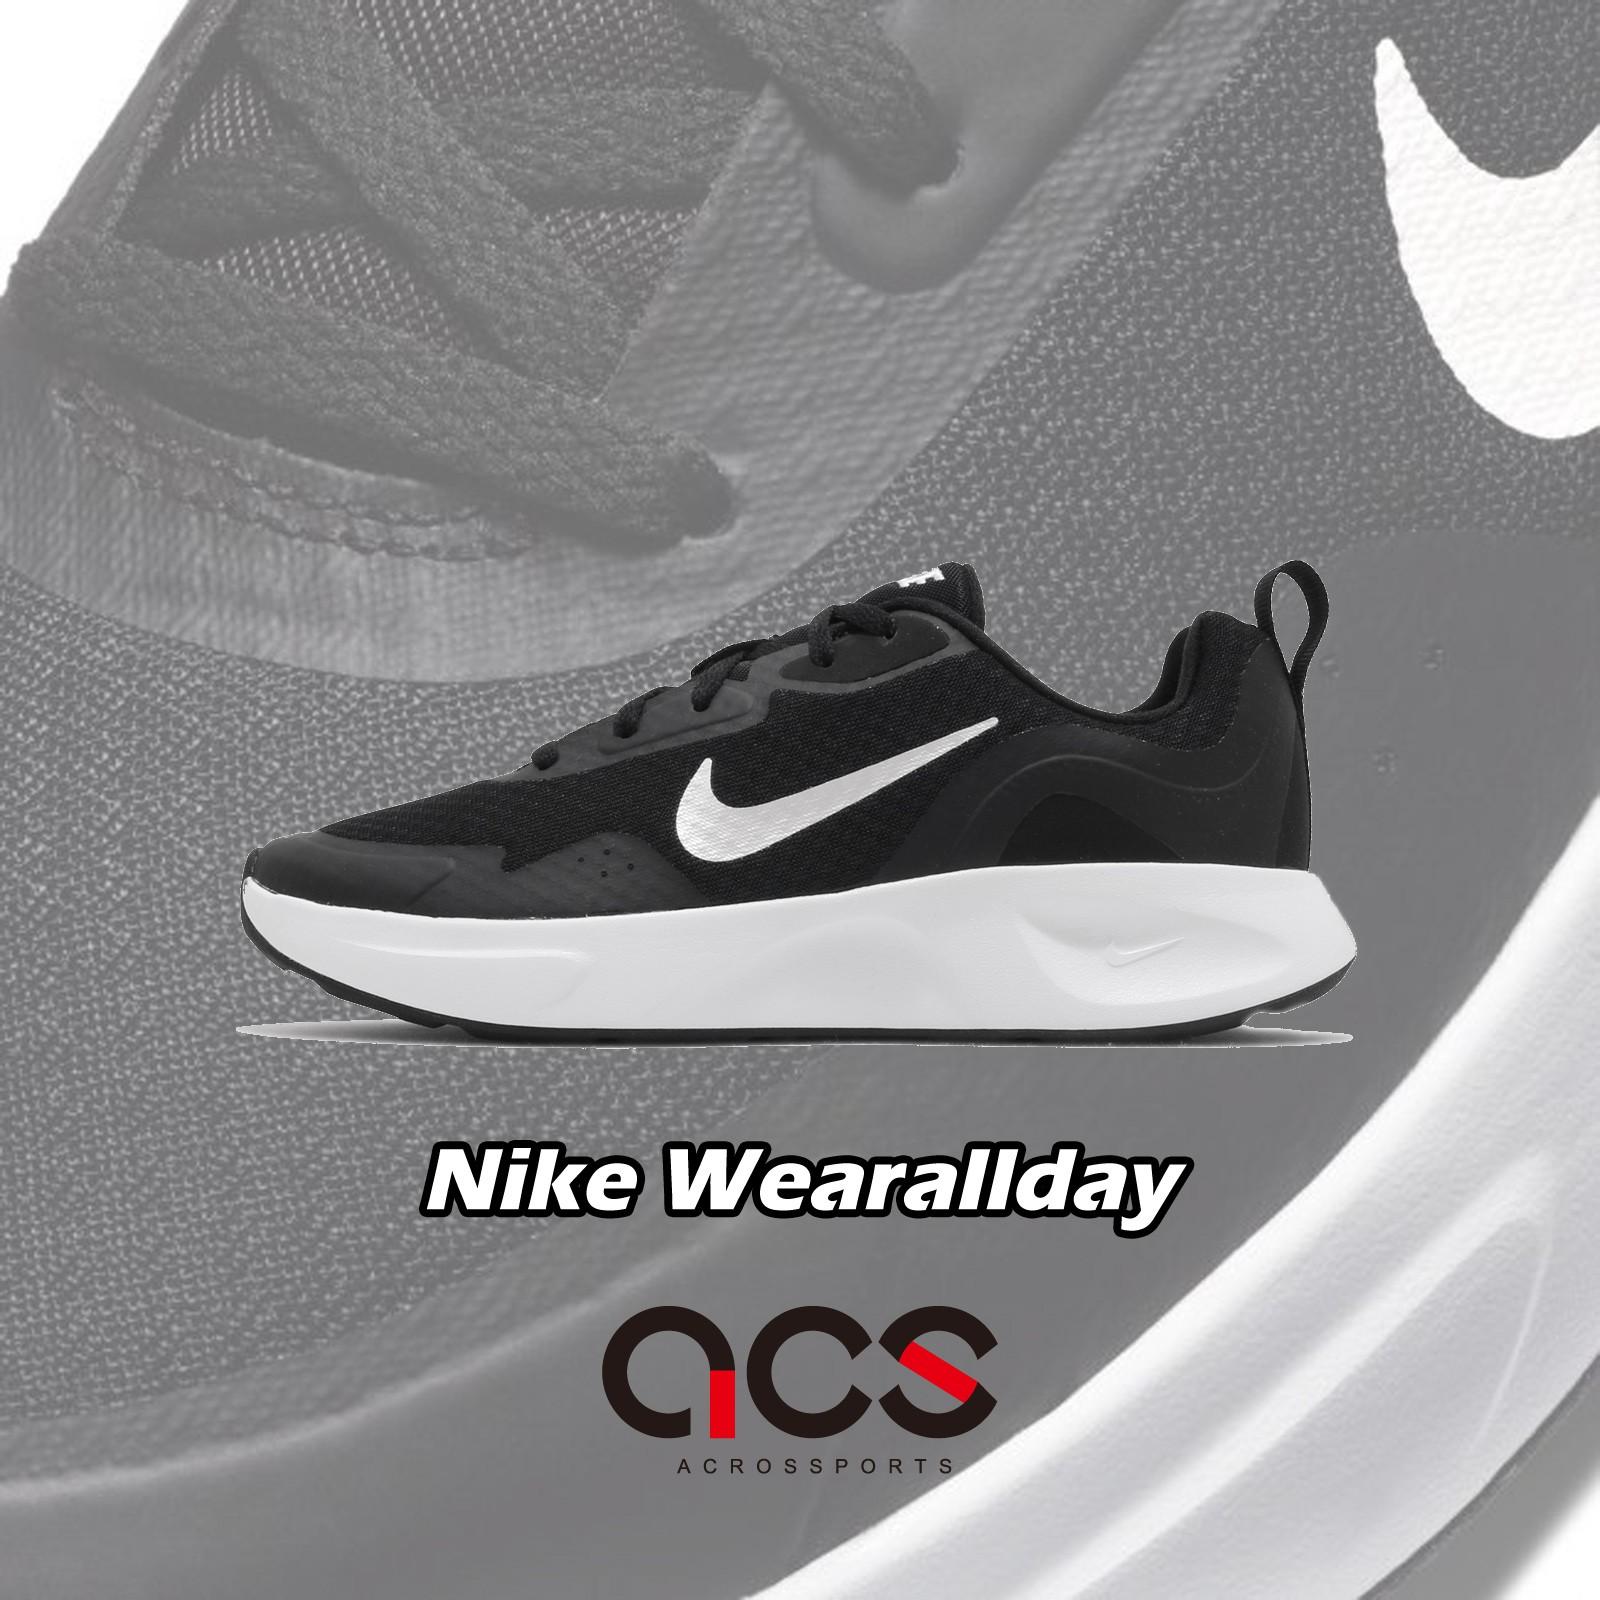 Nike 慢跑鞋 Wmns Wearallday 黑 白 低筒 女鞋 運動鞋 【ACS】 CJ1677-001